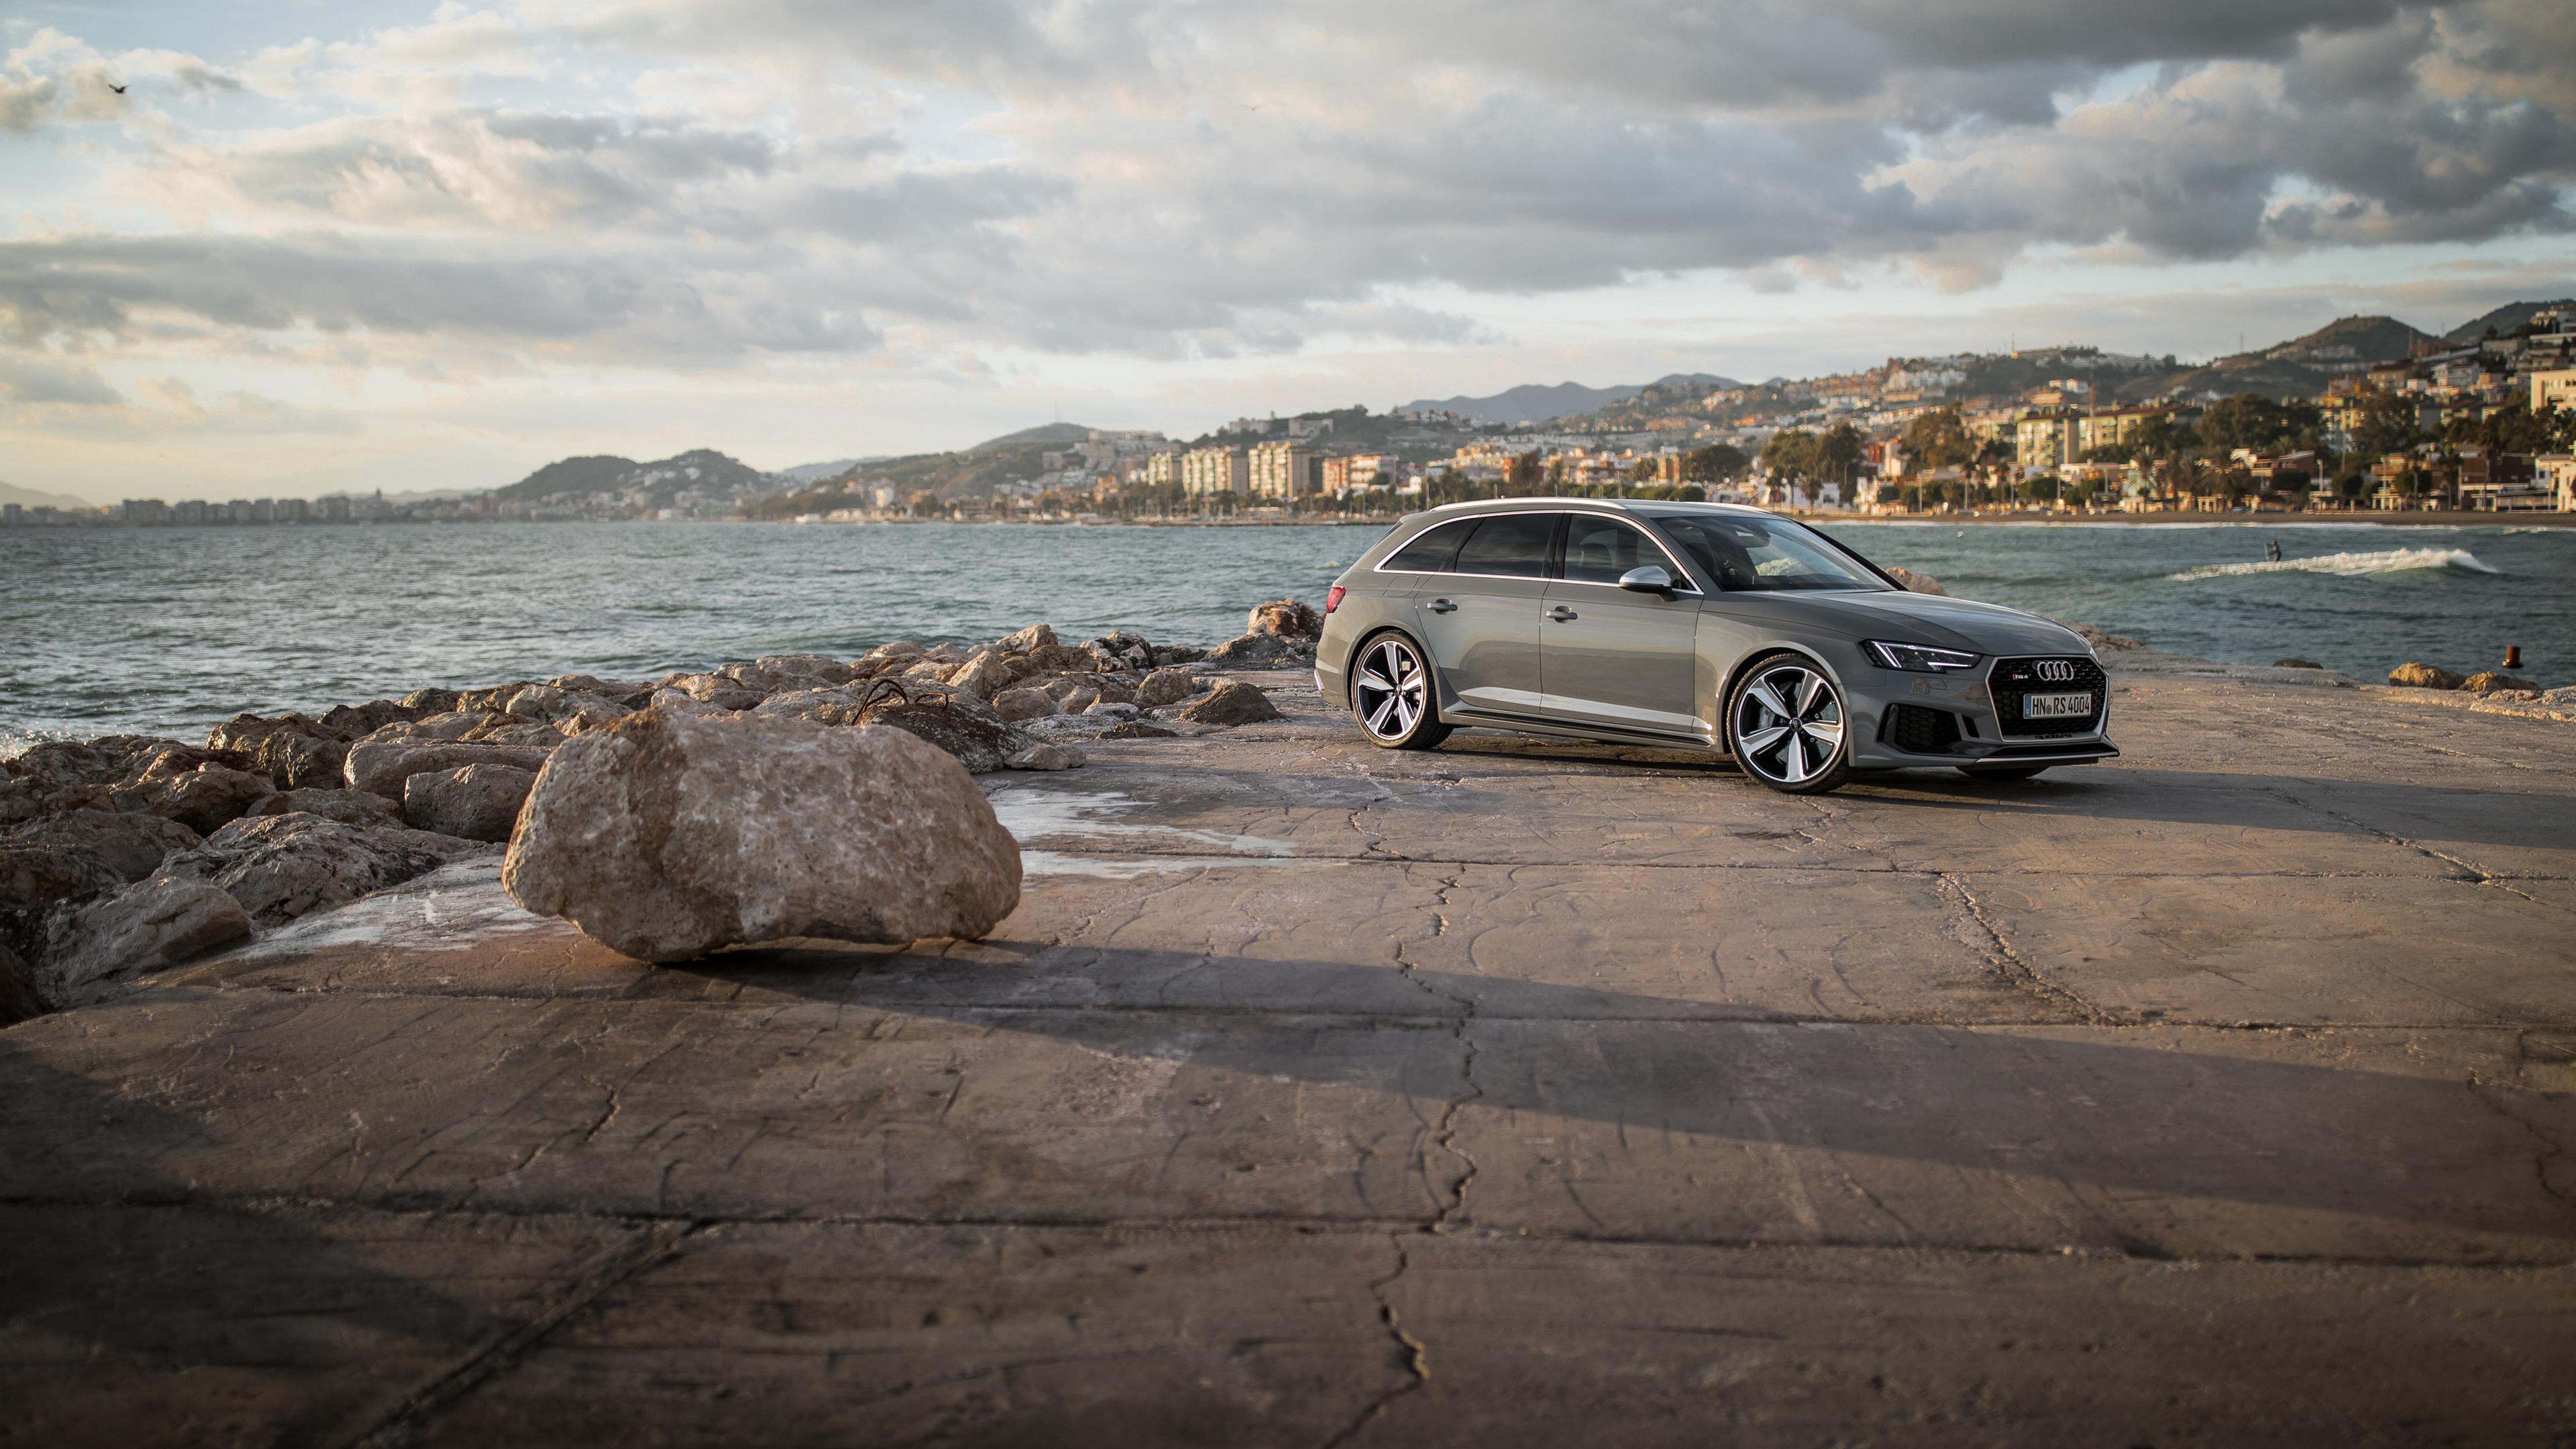 audi rs4 avant 4k 1539108559 - Audi RS4 Avant 4k - hd-wallpapers, cars wallpapers, audi wallpapers, audi rs 4 avant wallpapers, 4k-wallpapers, 2017 cars wallpapers